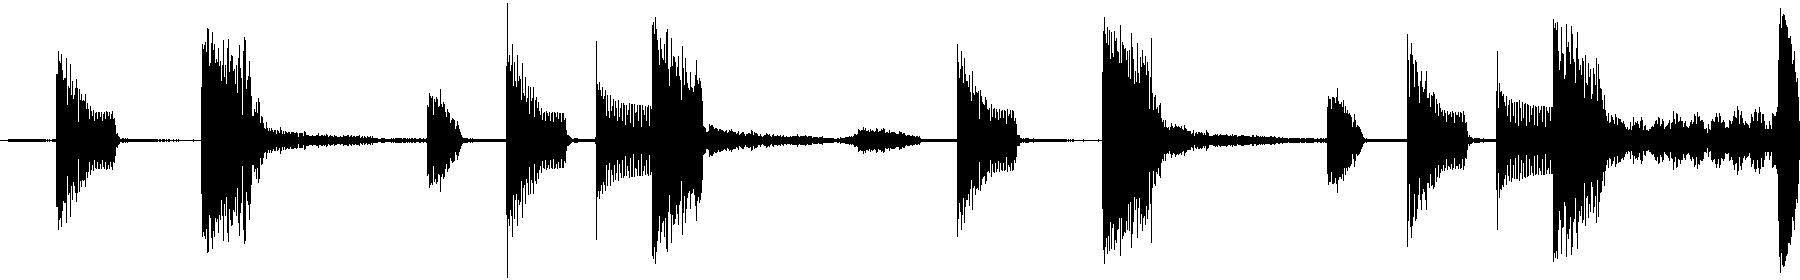 vedh melodyloop 003 fm 125bpm